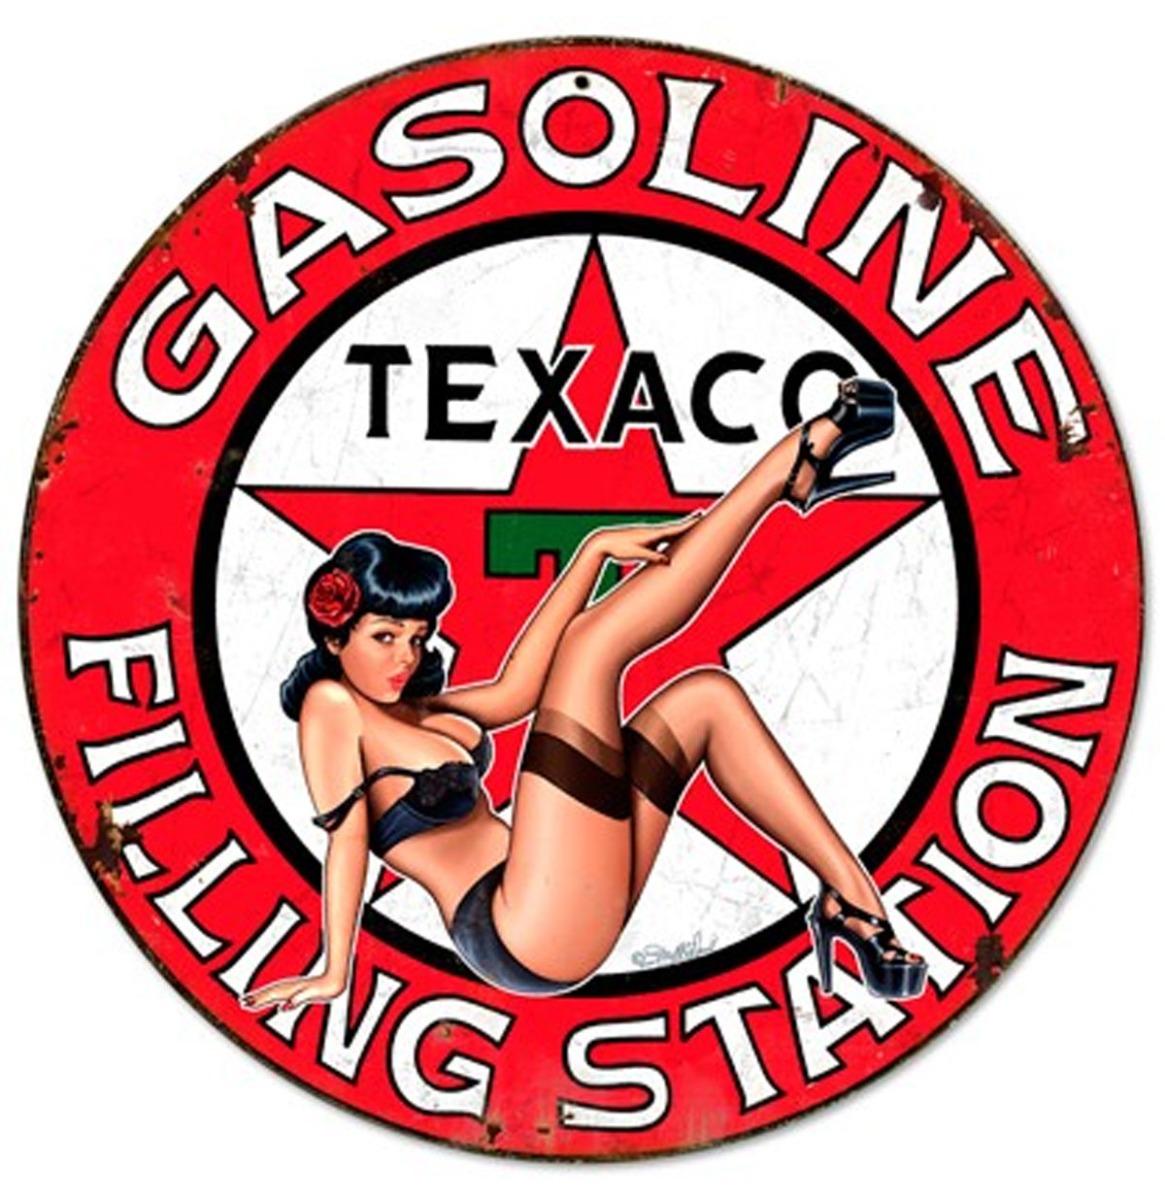 Texaco Gasoline Filling Station Pin-Up Zwaar Metalen Bord 35,5 cm